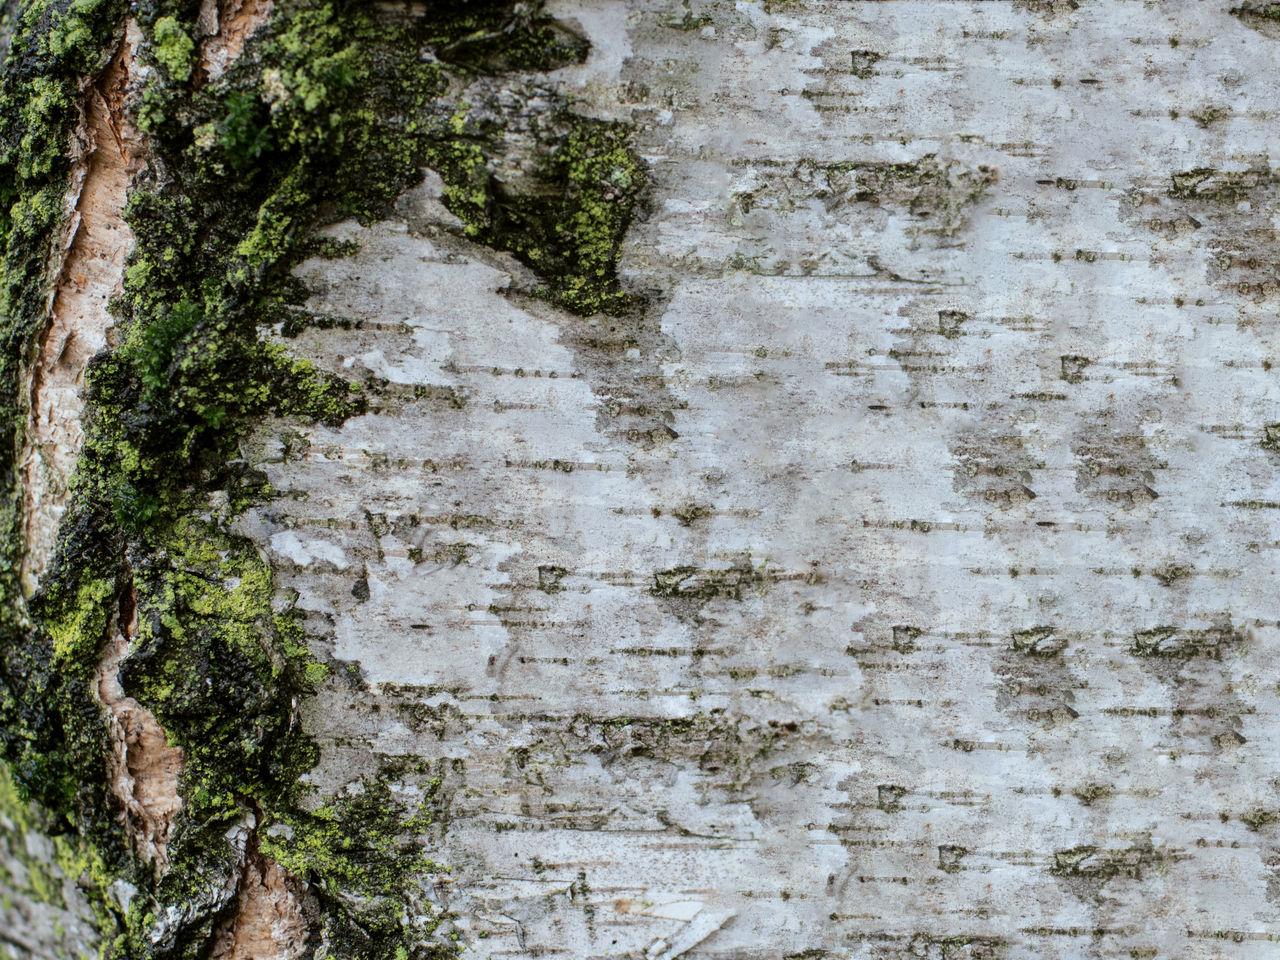 cirteccia 2 Backgrounds Bark Bark Moss Bark Texture Bark Texture Background Bark Tree Bark Tree Texture Barks Of A Tree Close-up Full Frame Moss Moss On Trees Textured  Tree Moss Tree Texture White Bark White Wood Wood